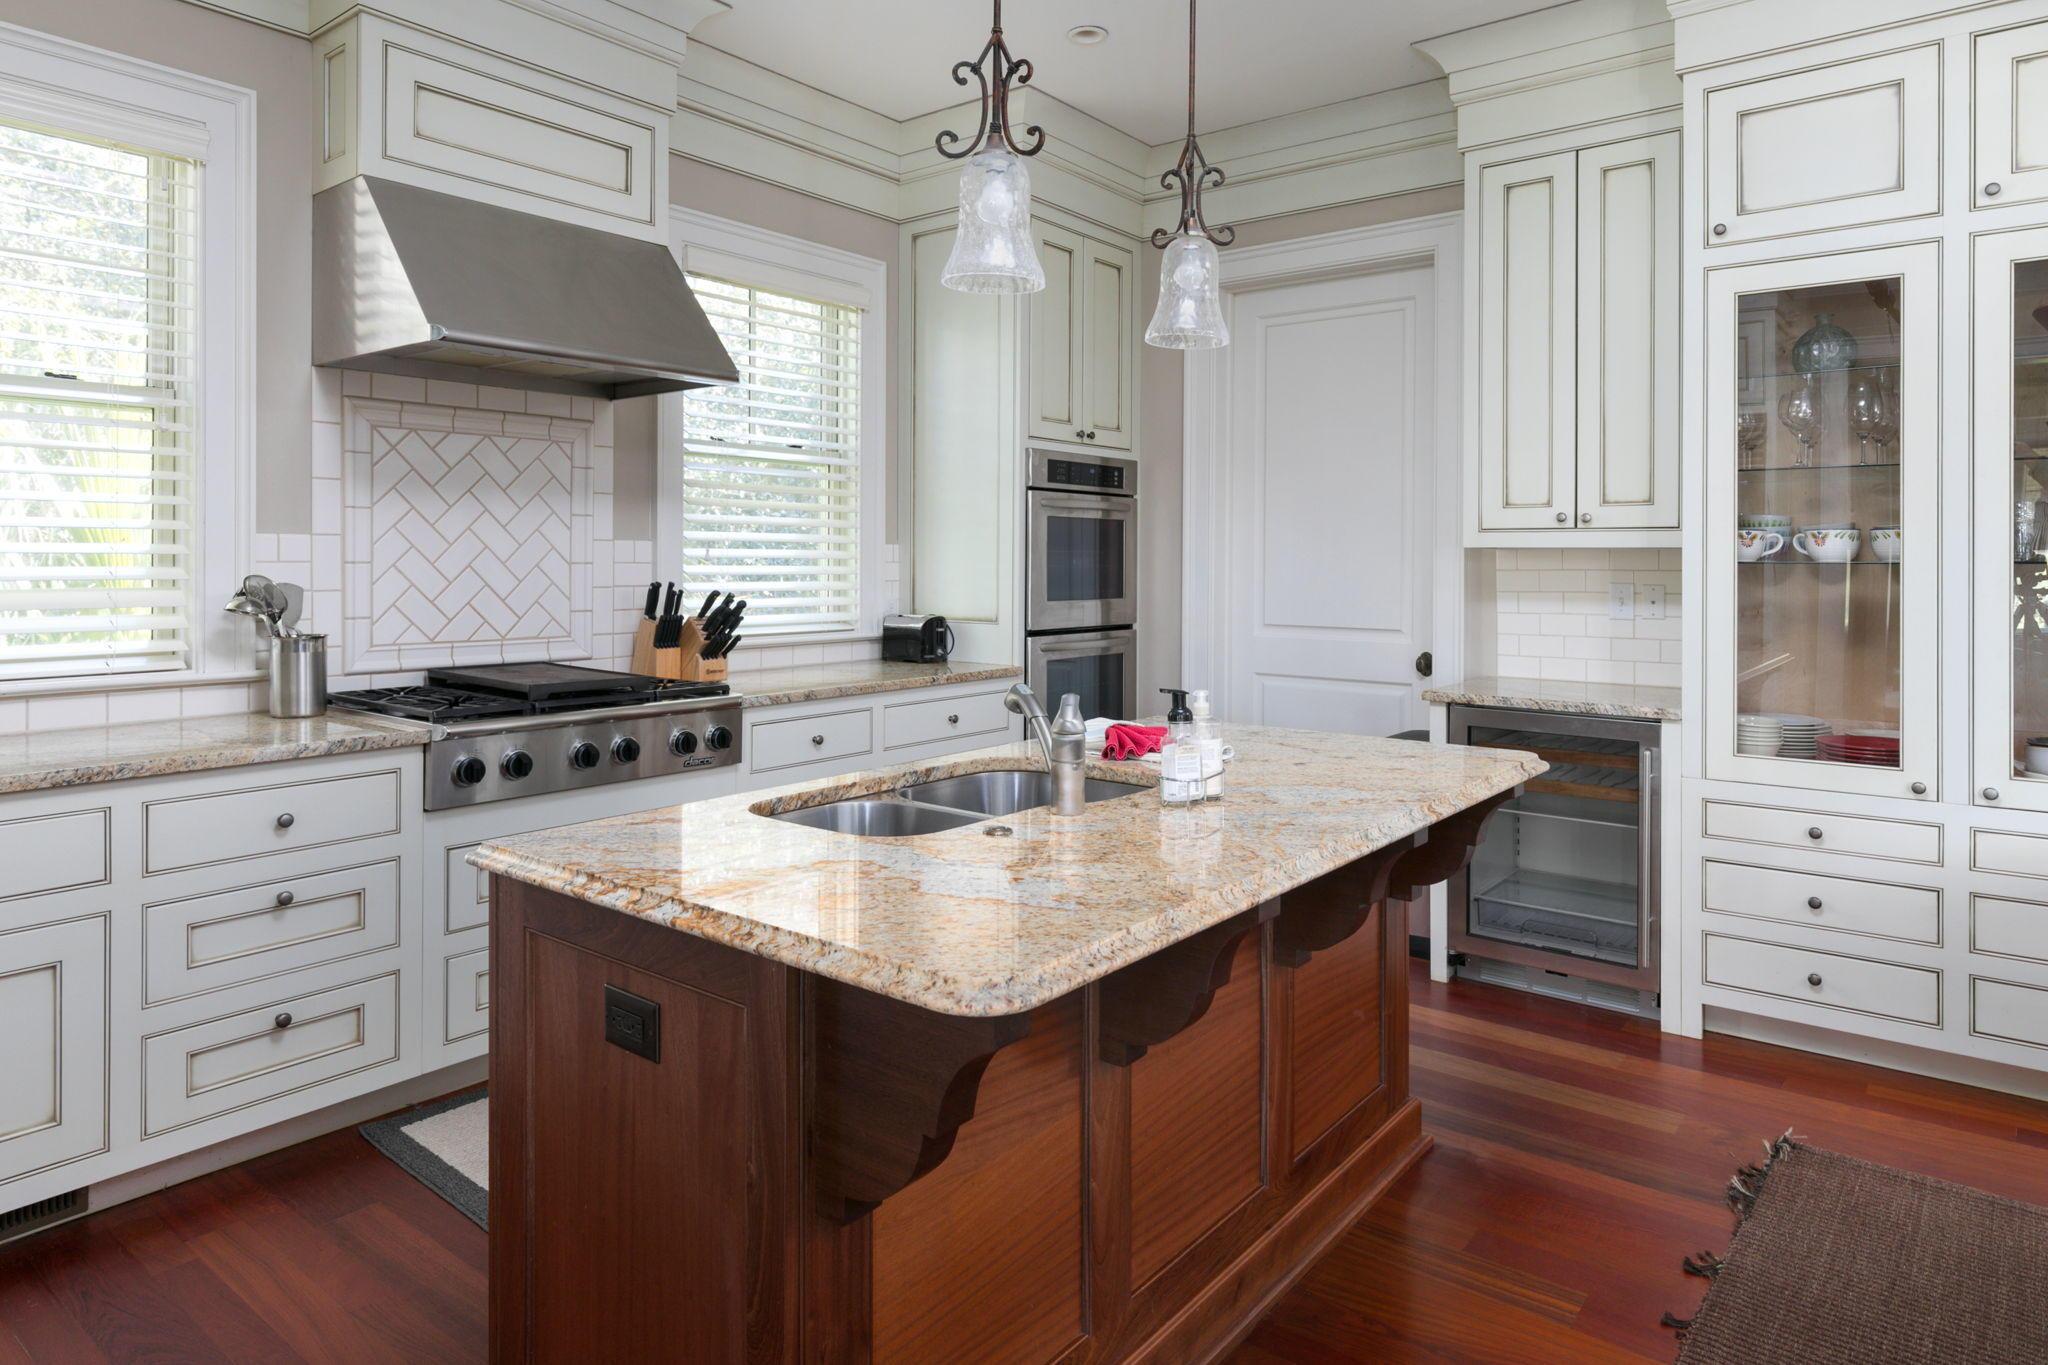 Egret/Pintail Homes For Sale - 117 Bufflehead, Kiawah Island, SC - 40